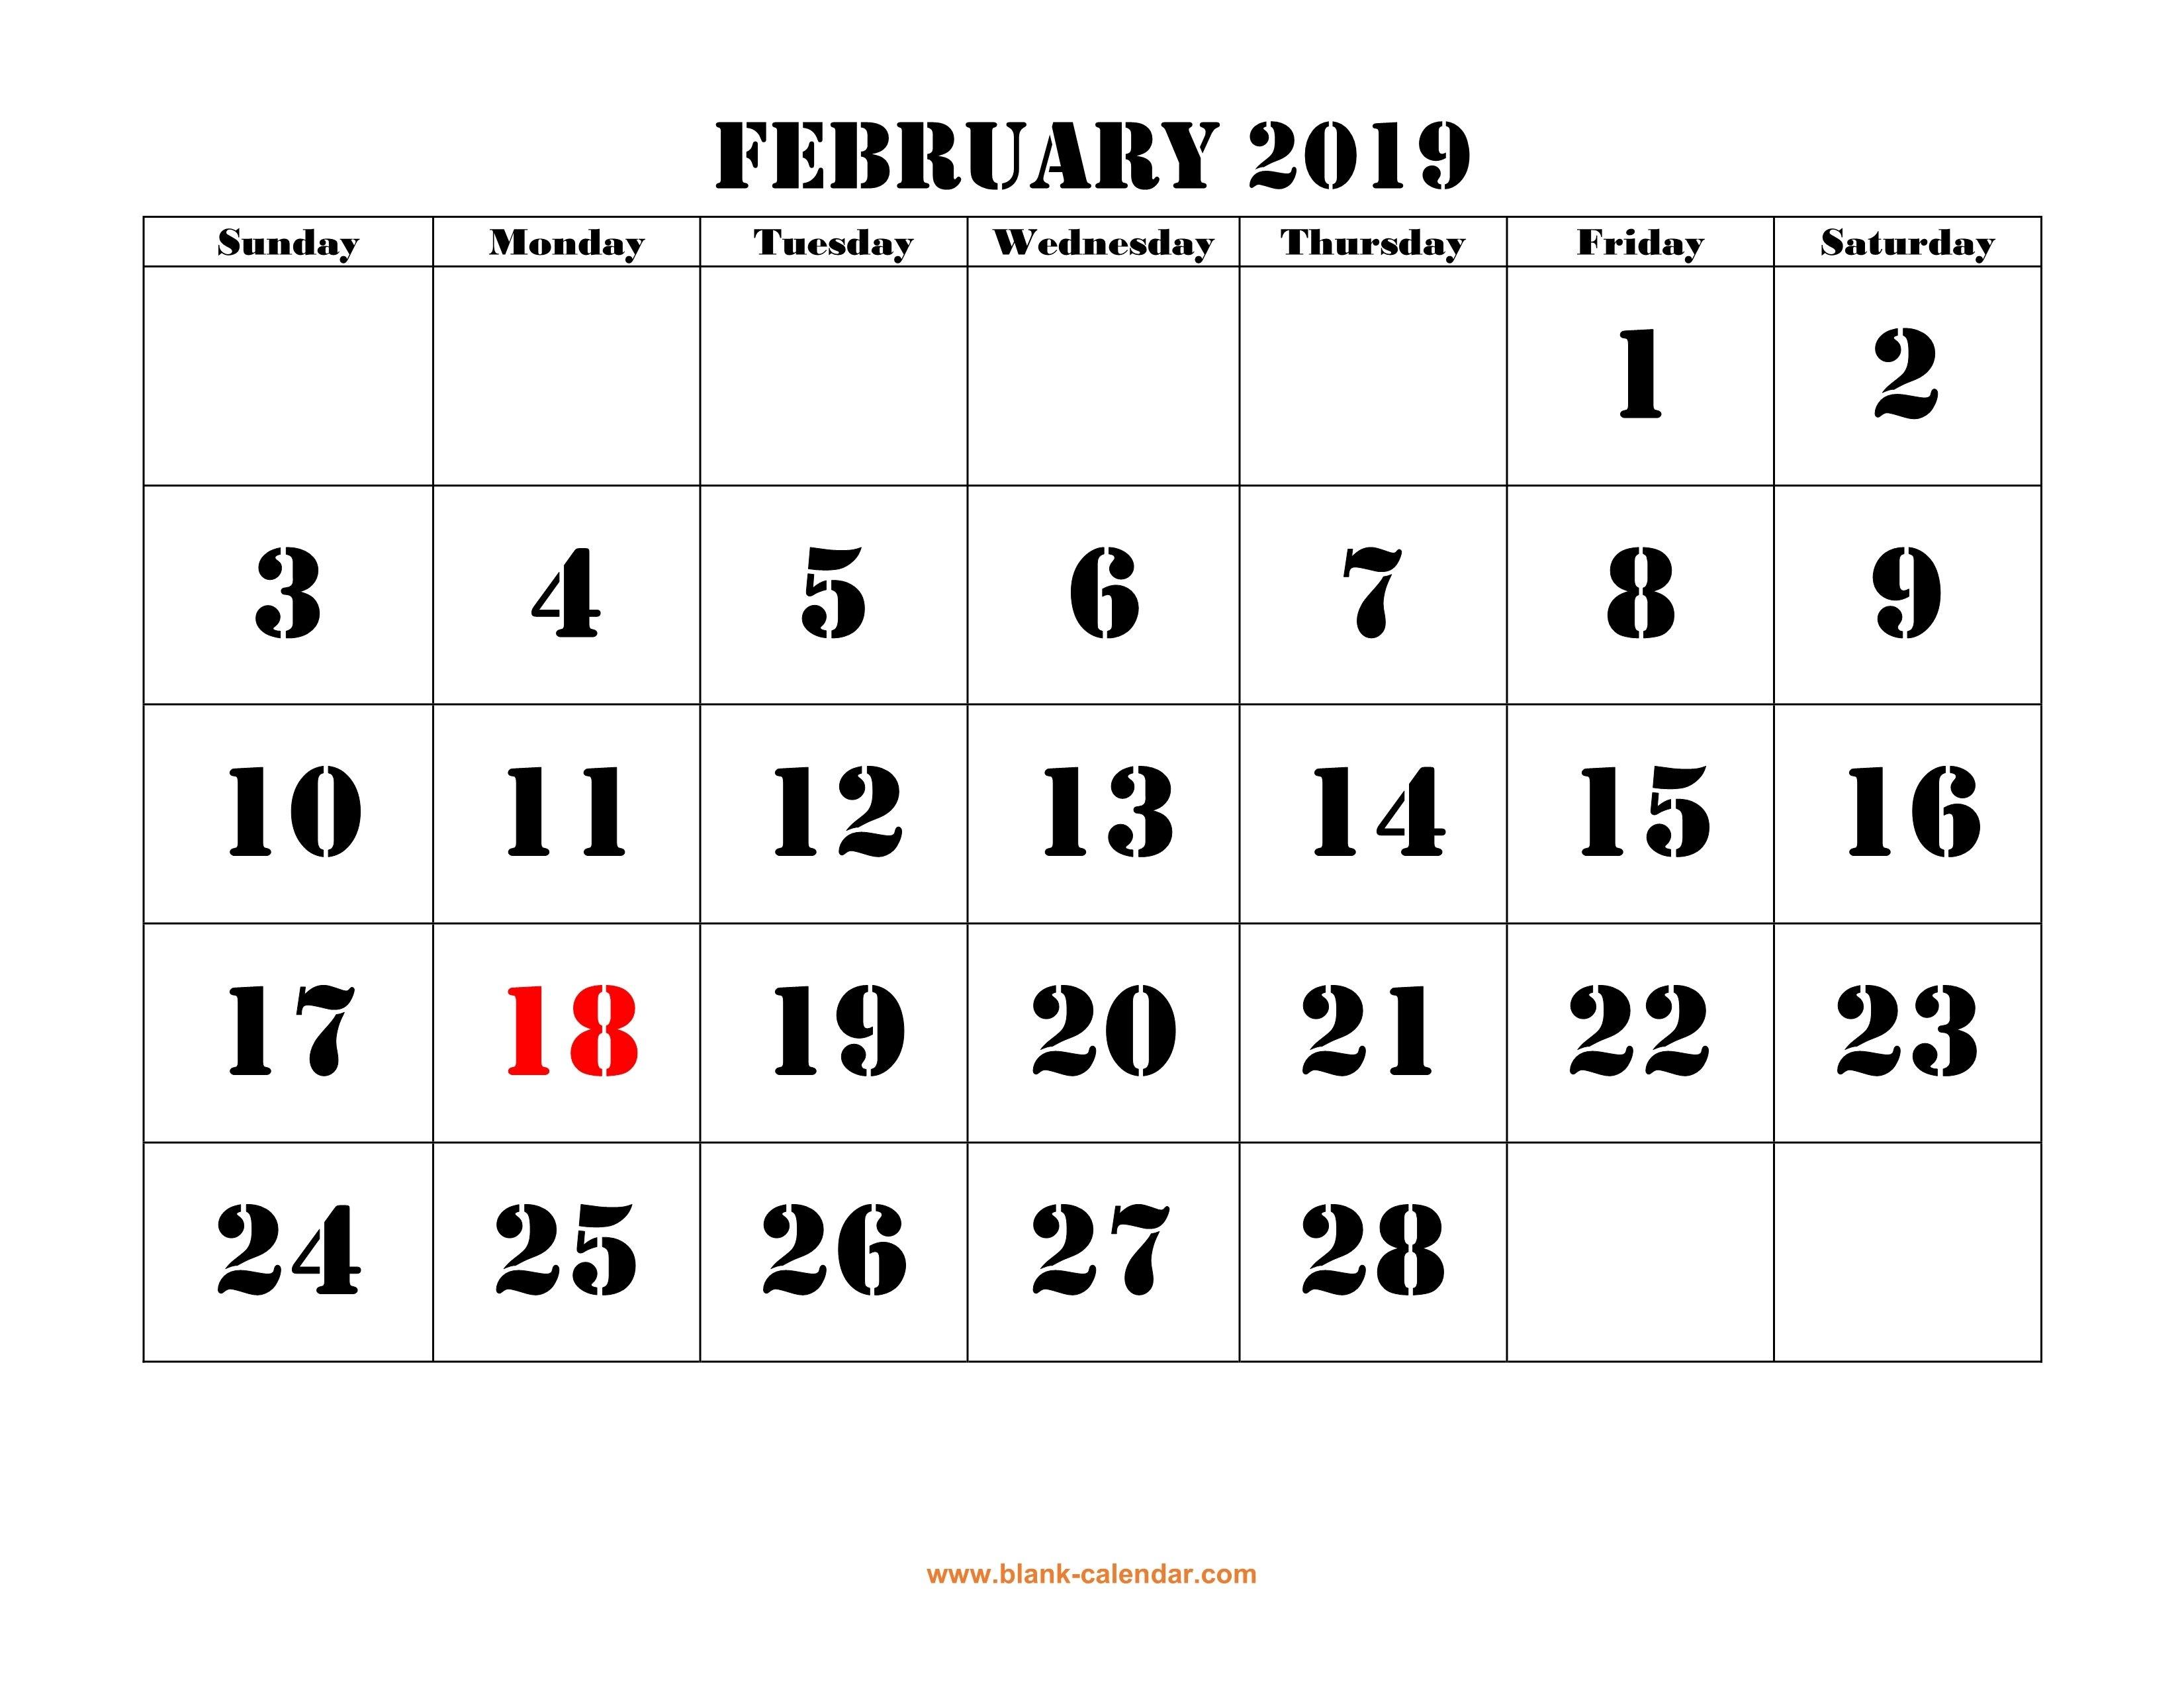 February 2019 Printable Calendar | Free Download Monthly Calendar Calendar 2019 Large Print